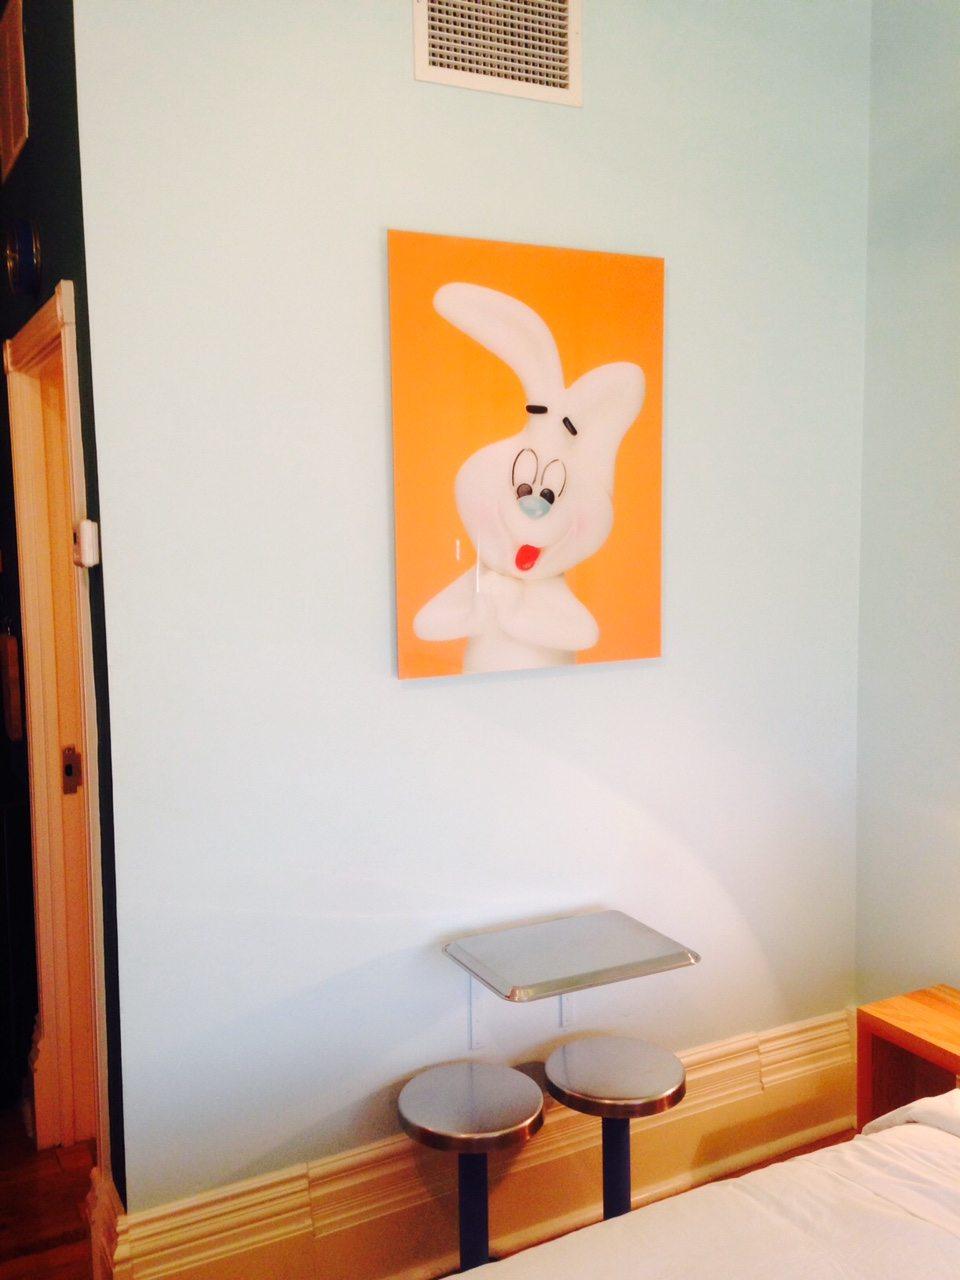 toronto-chefs-restaurants-consumed-bob-blumer-food-network-surreal-gourmet-trix-bunny